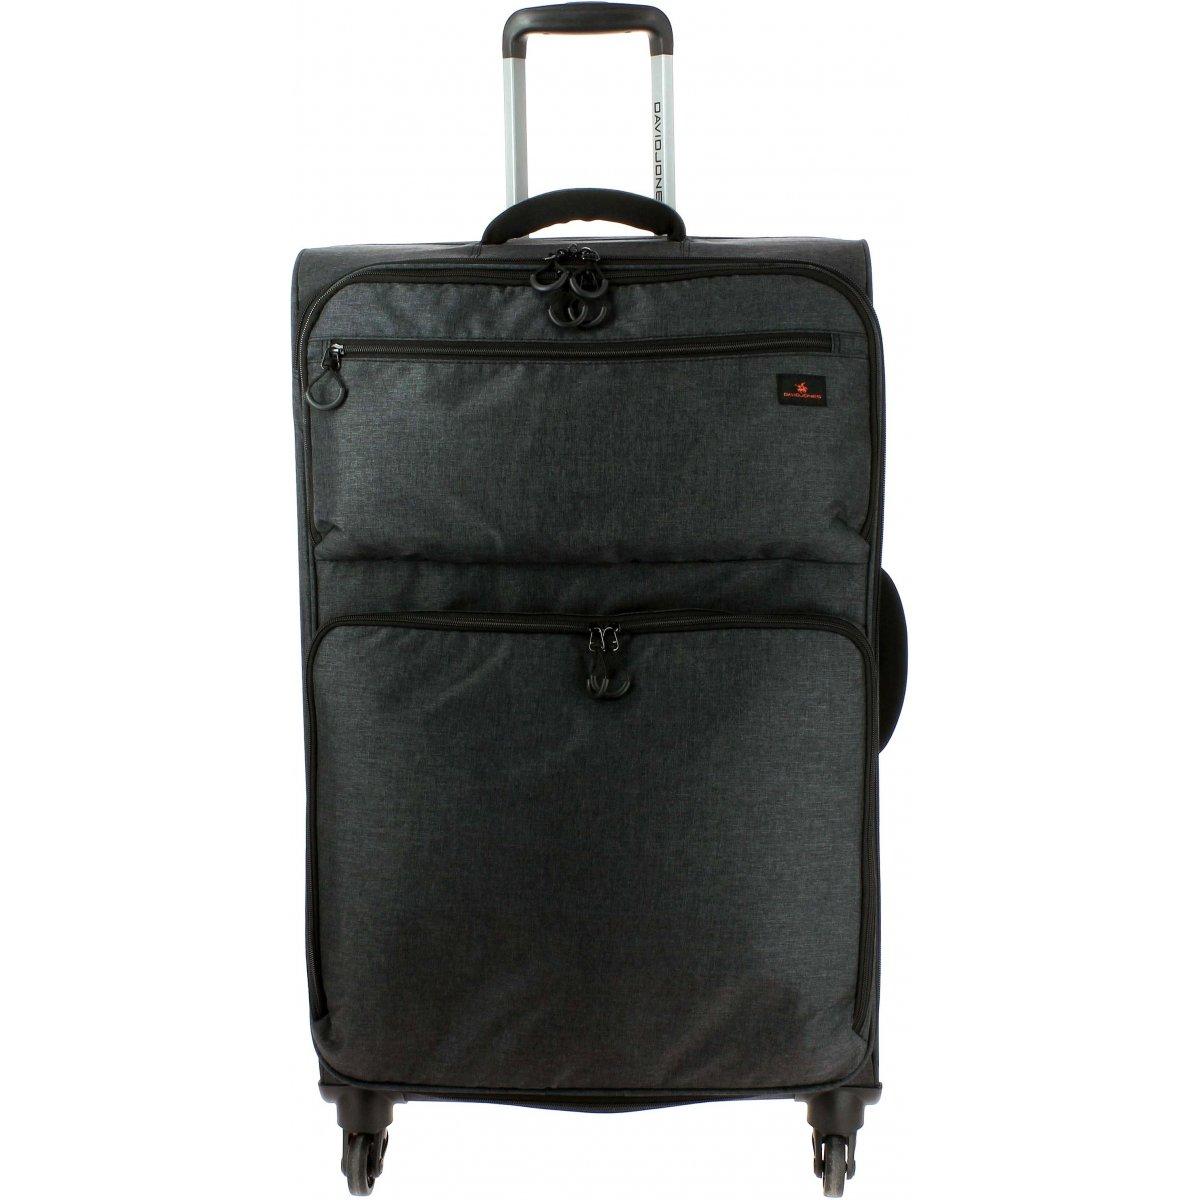 valise souple david jones polyester 77 cm grande taille ba50311g couleur principale noir. Black Bedroom Furniture Sets. Home Design Ideas